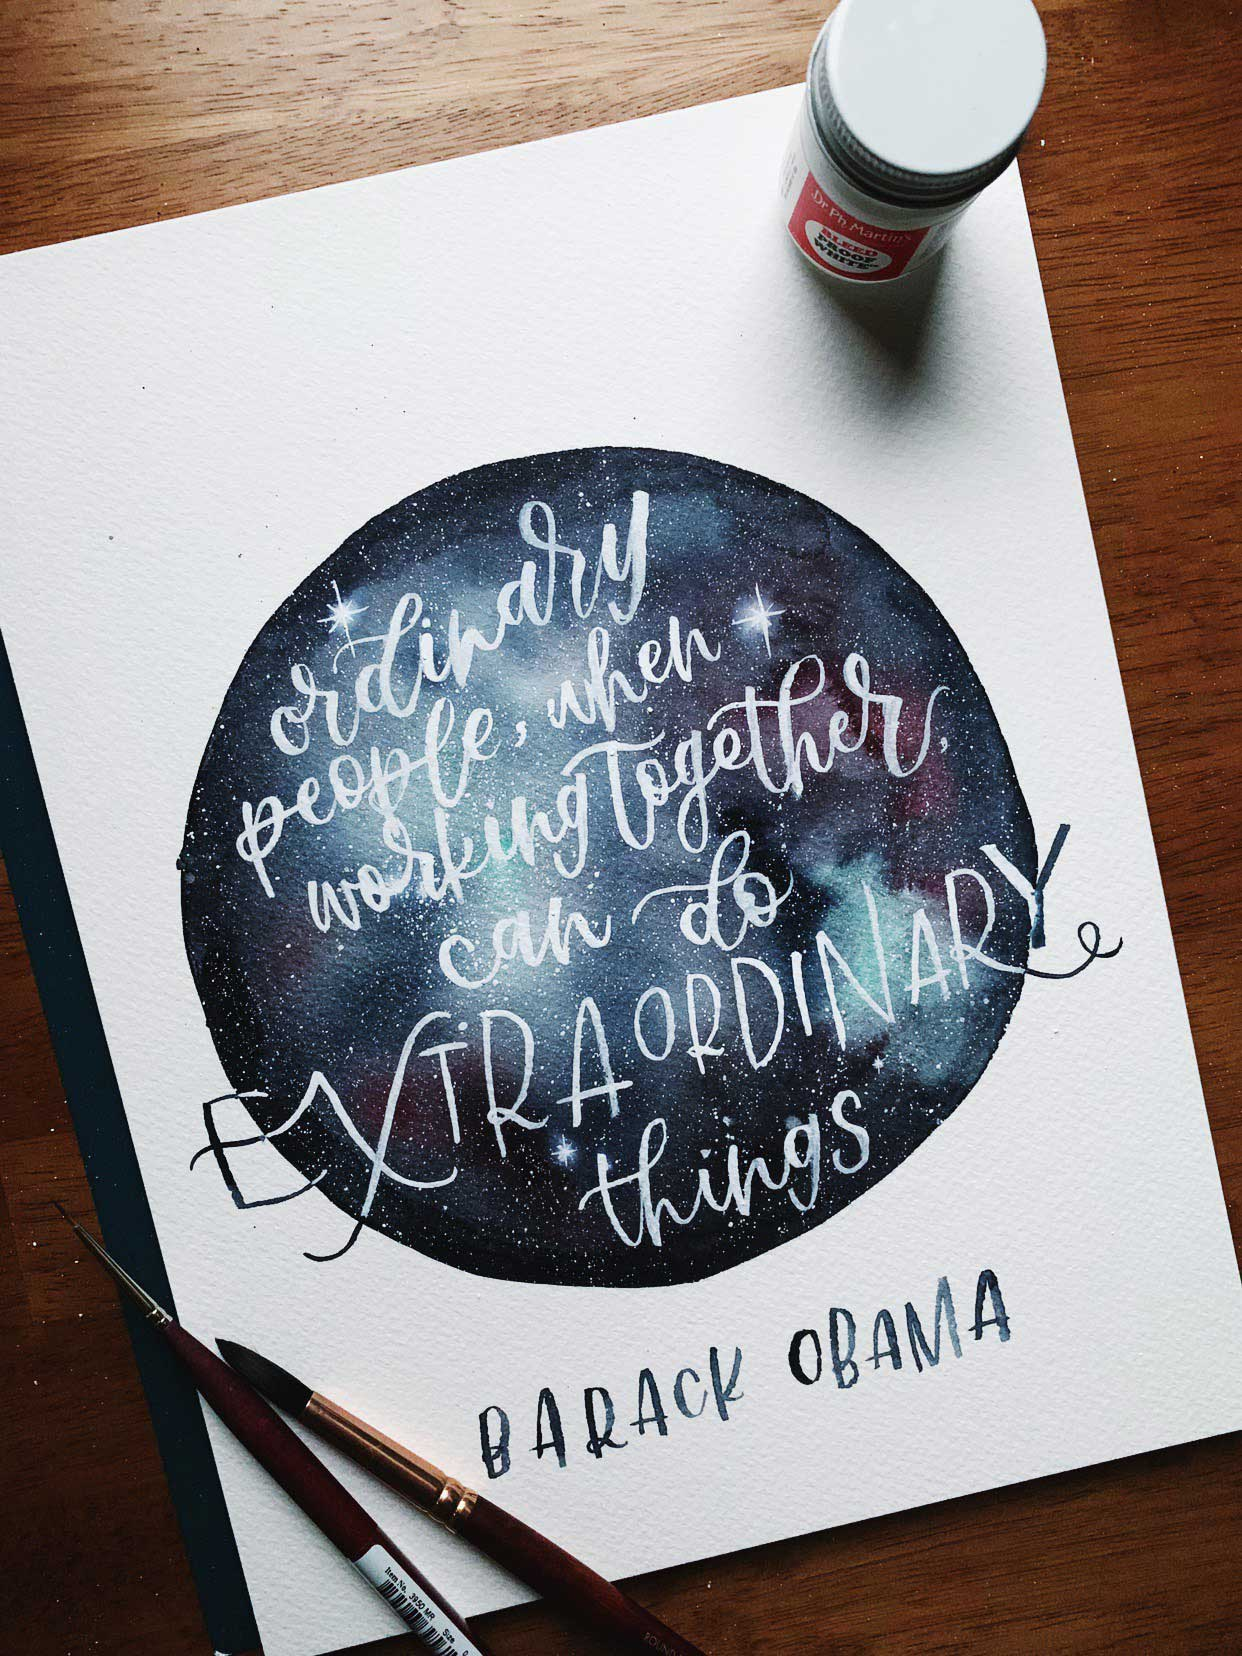 Lettering Illustrator of a Barack Obama quote